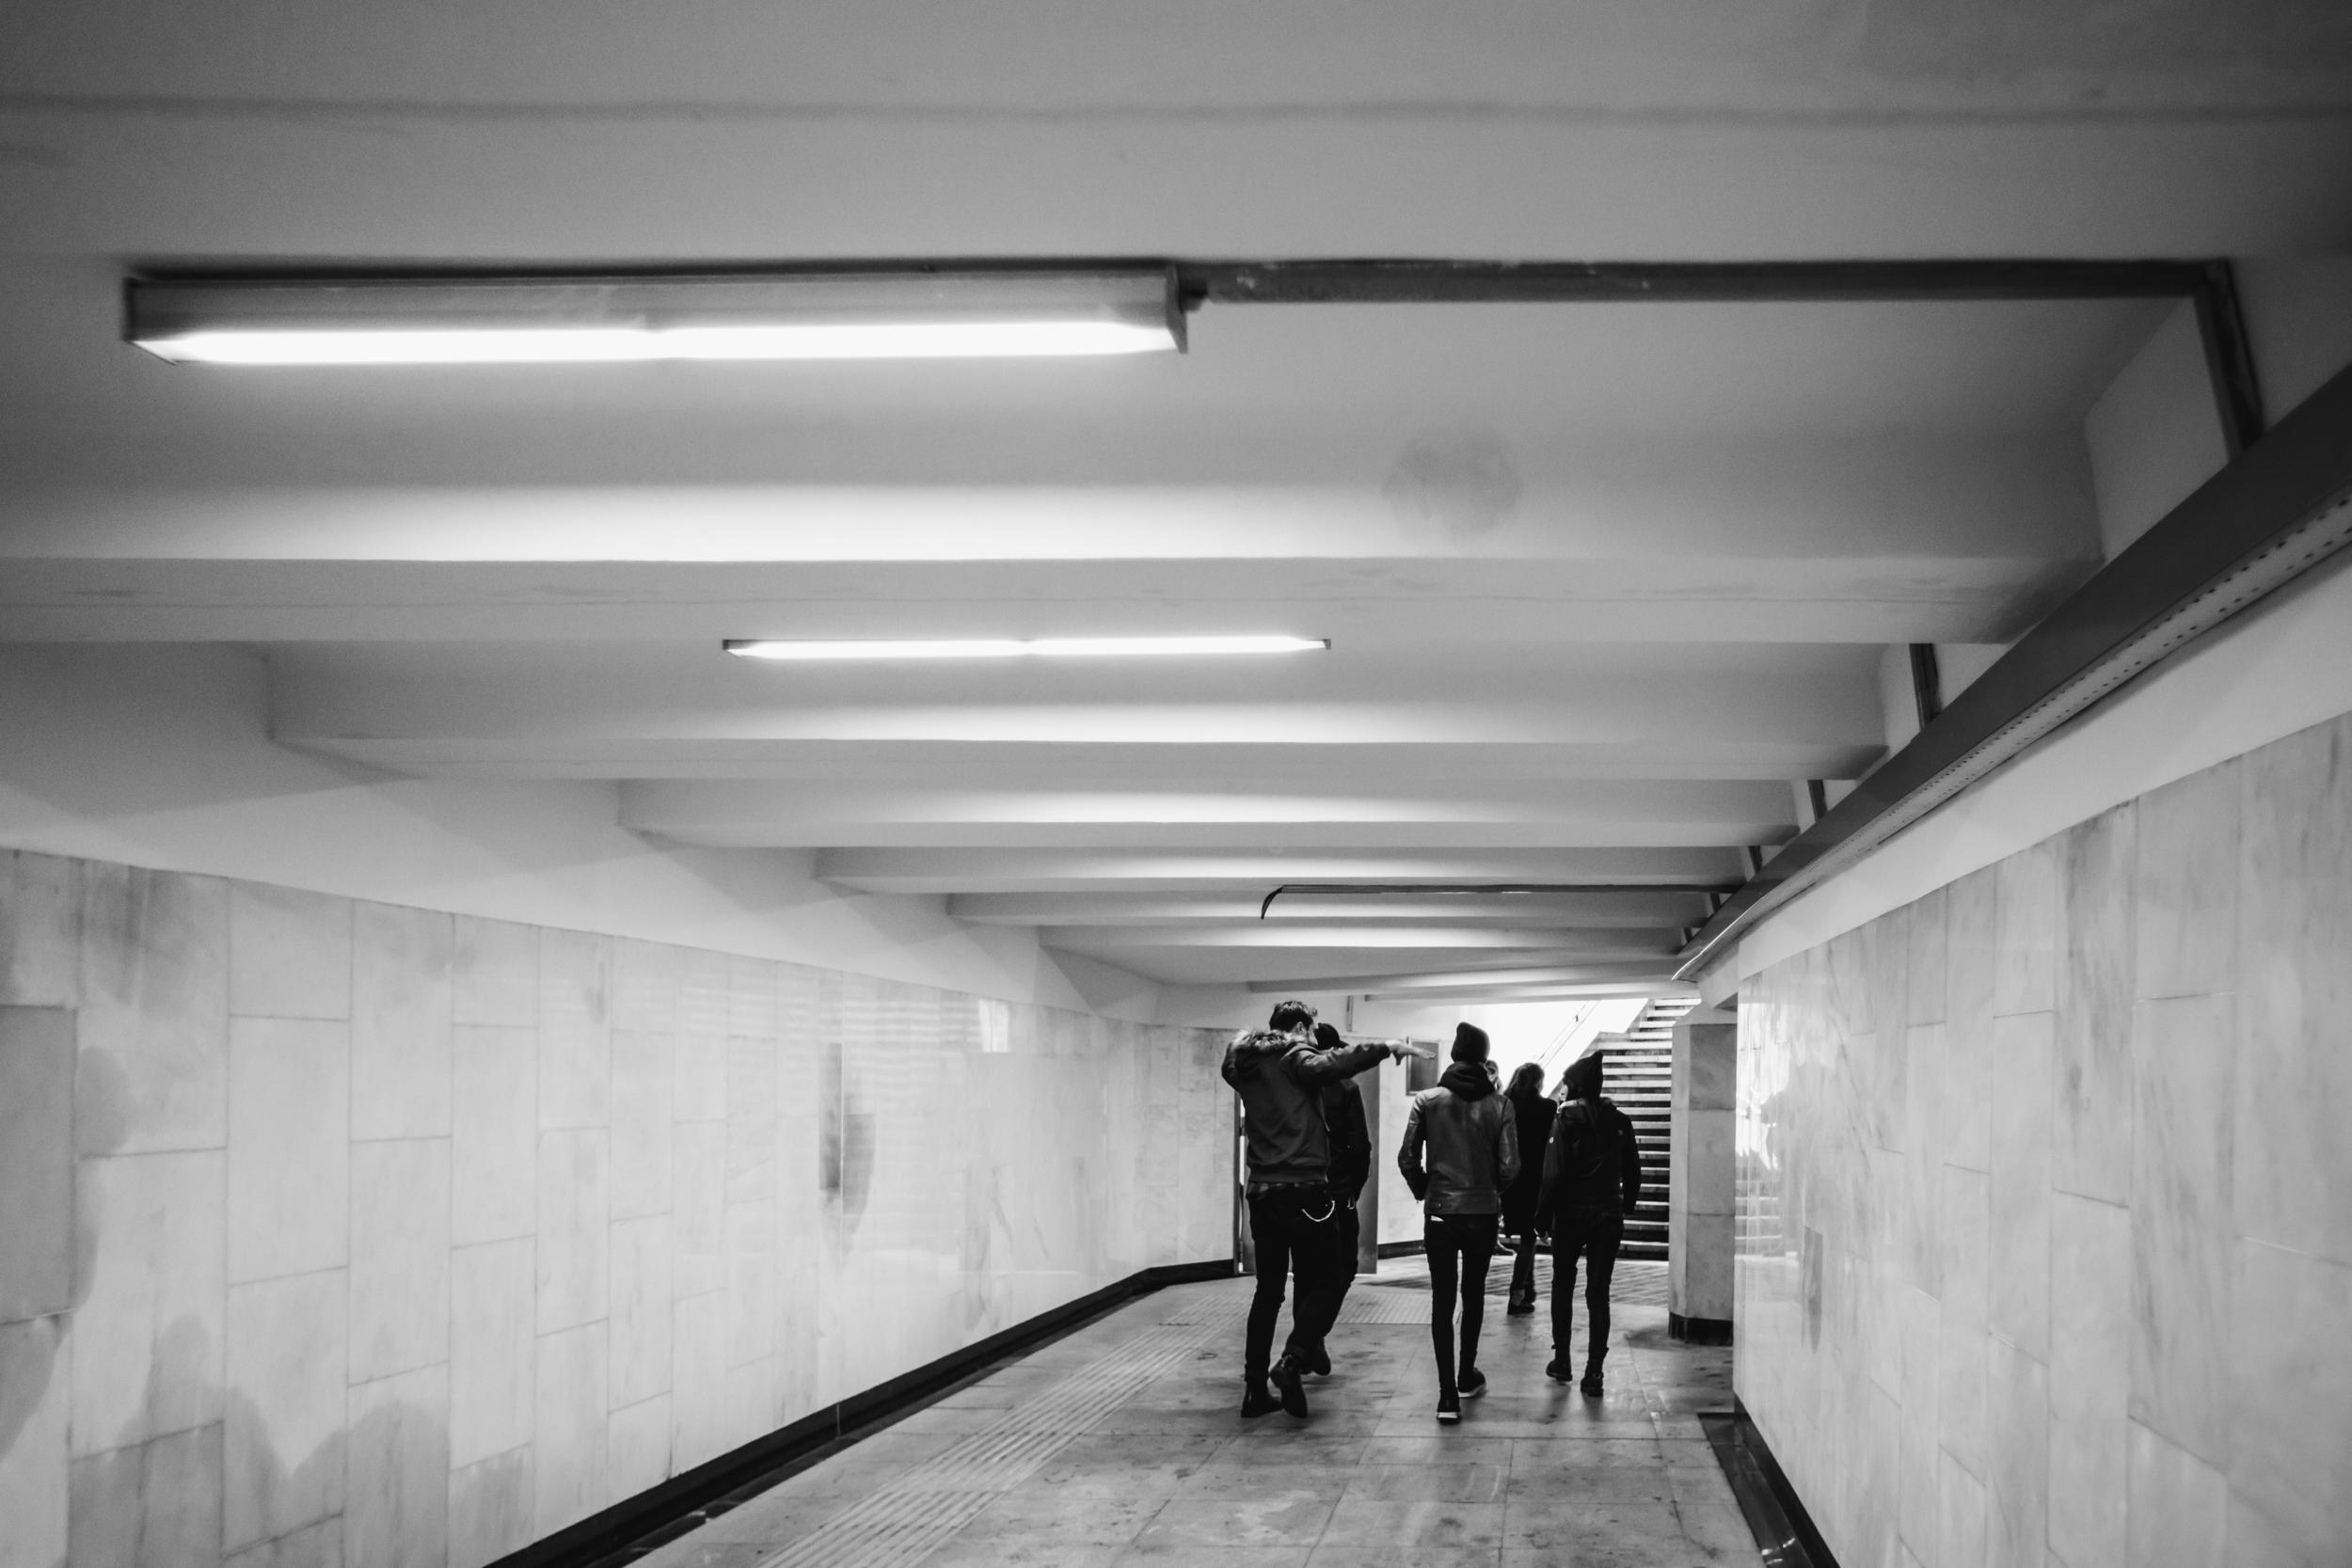 Moscow subways